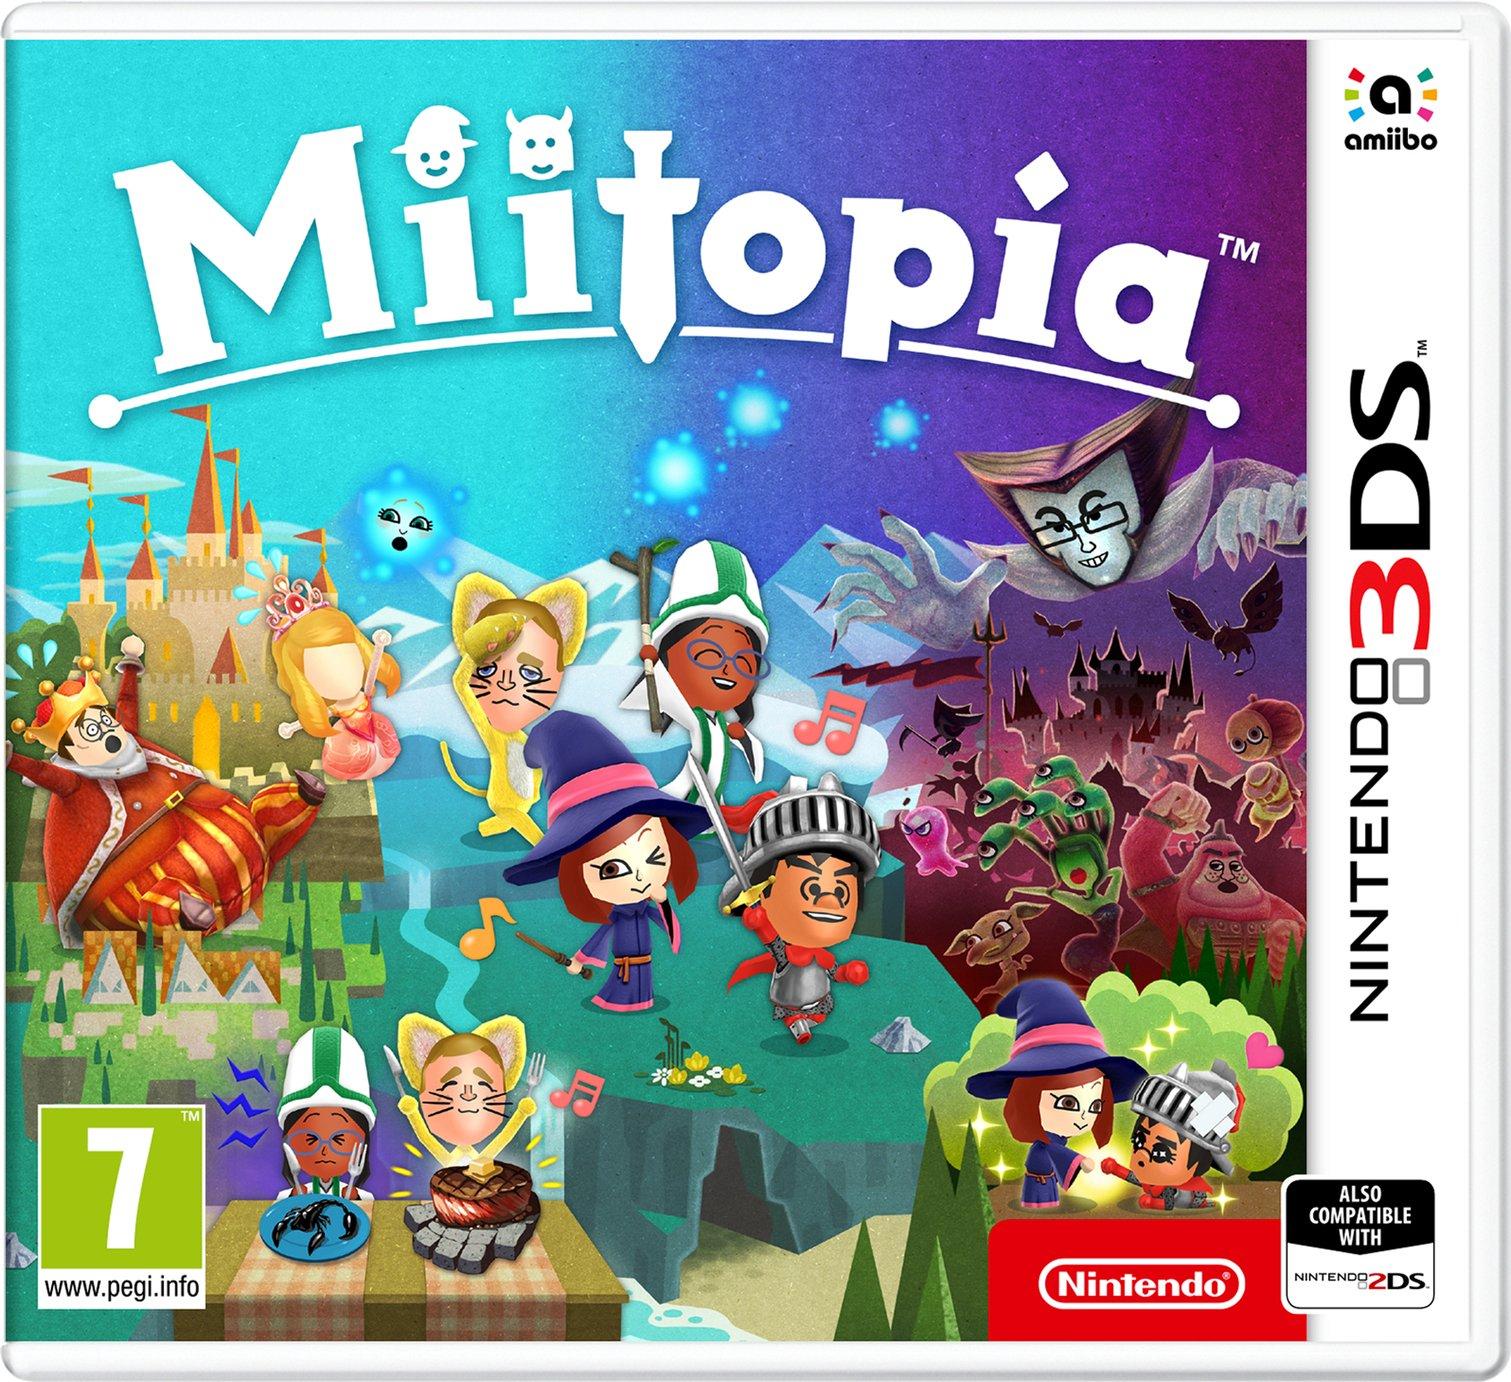 Miitopia (Nintendo 3DS) - £13.99 @ Argos